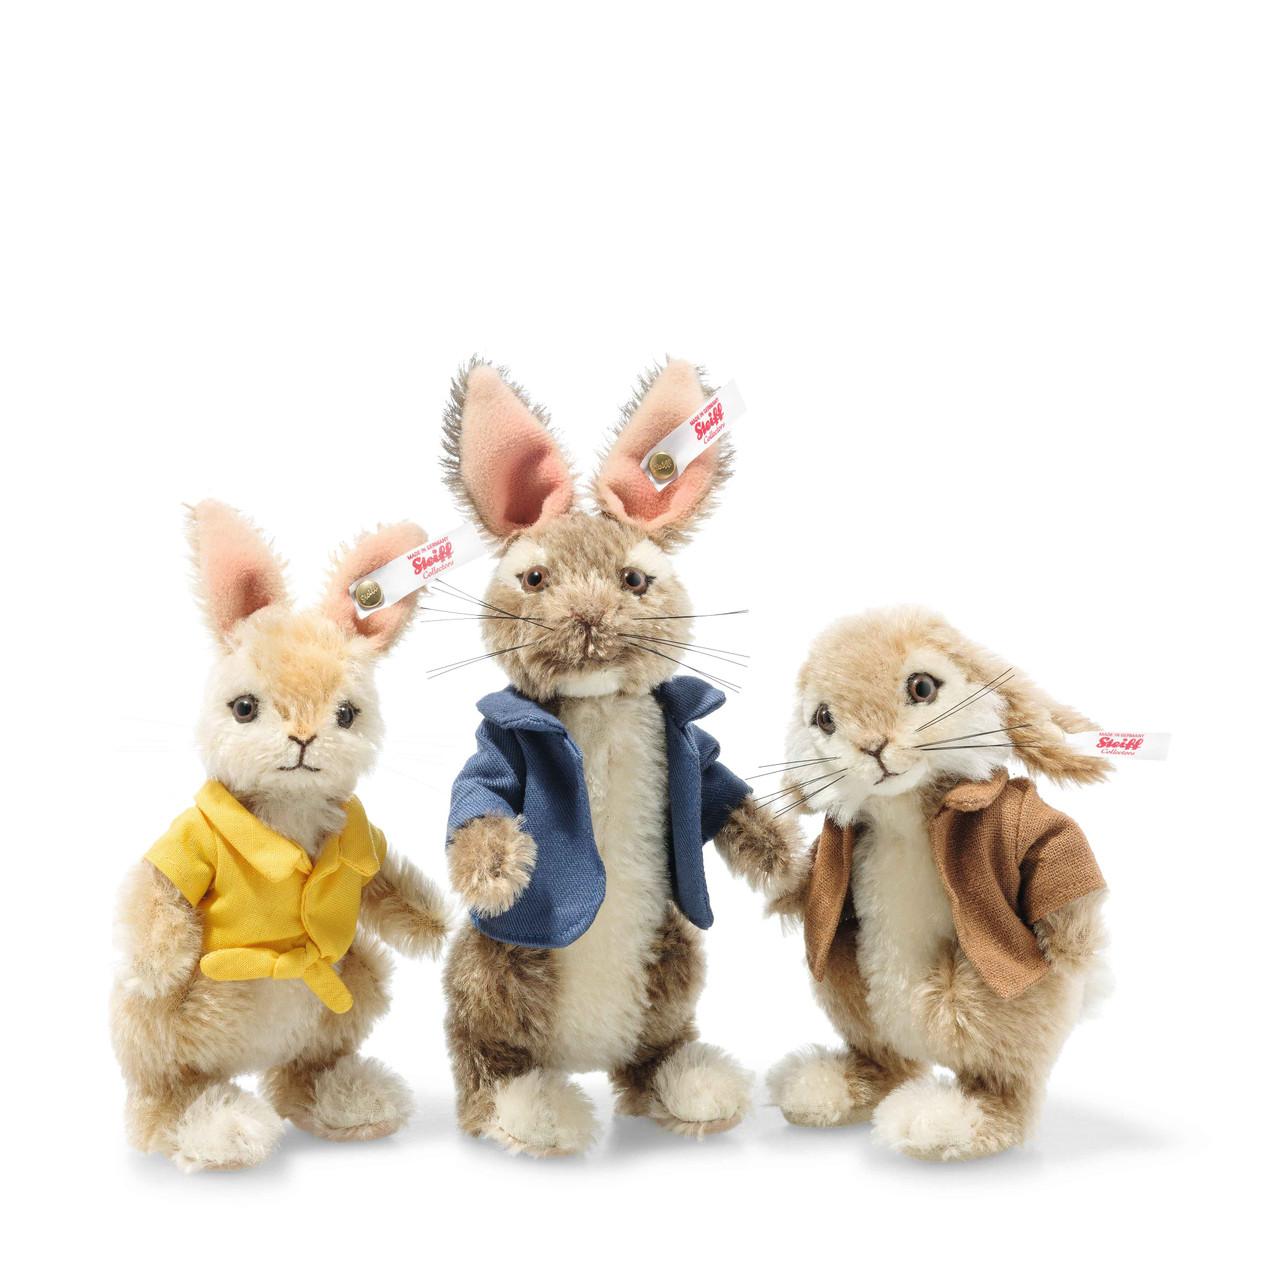 Peter Rabbit 3 Piece Gift Set Steiff Usa